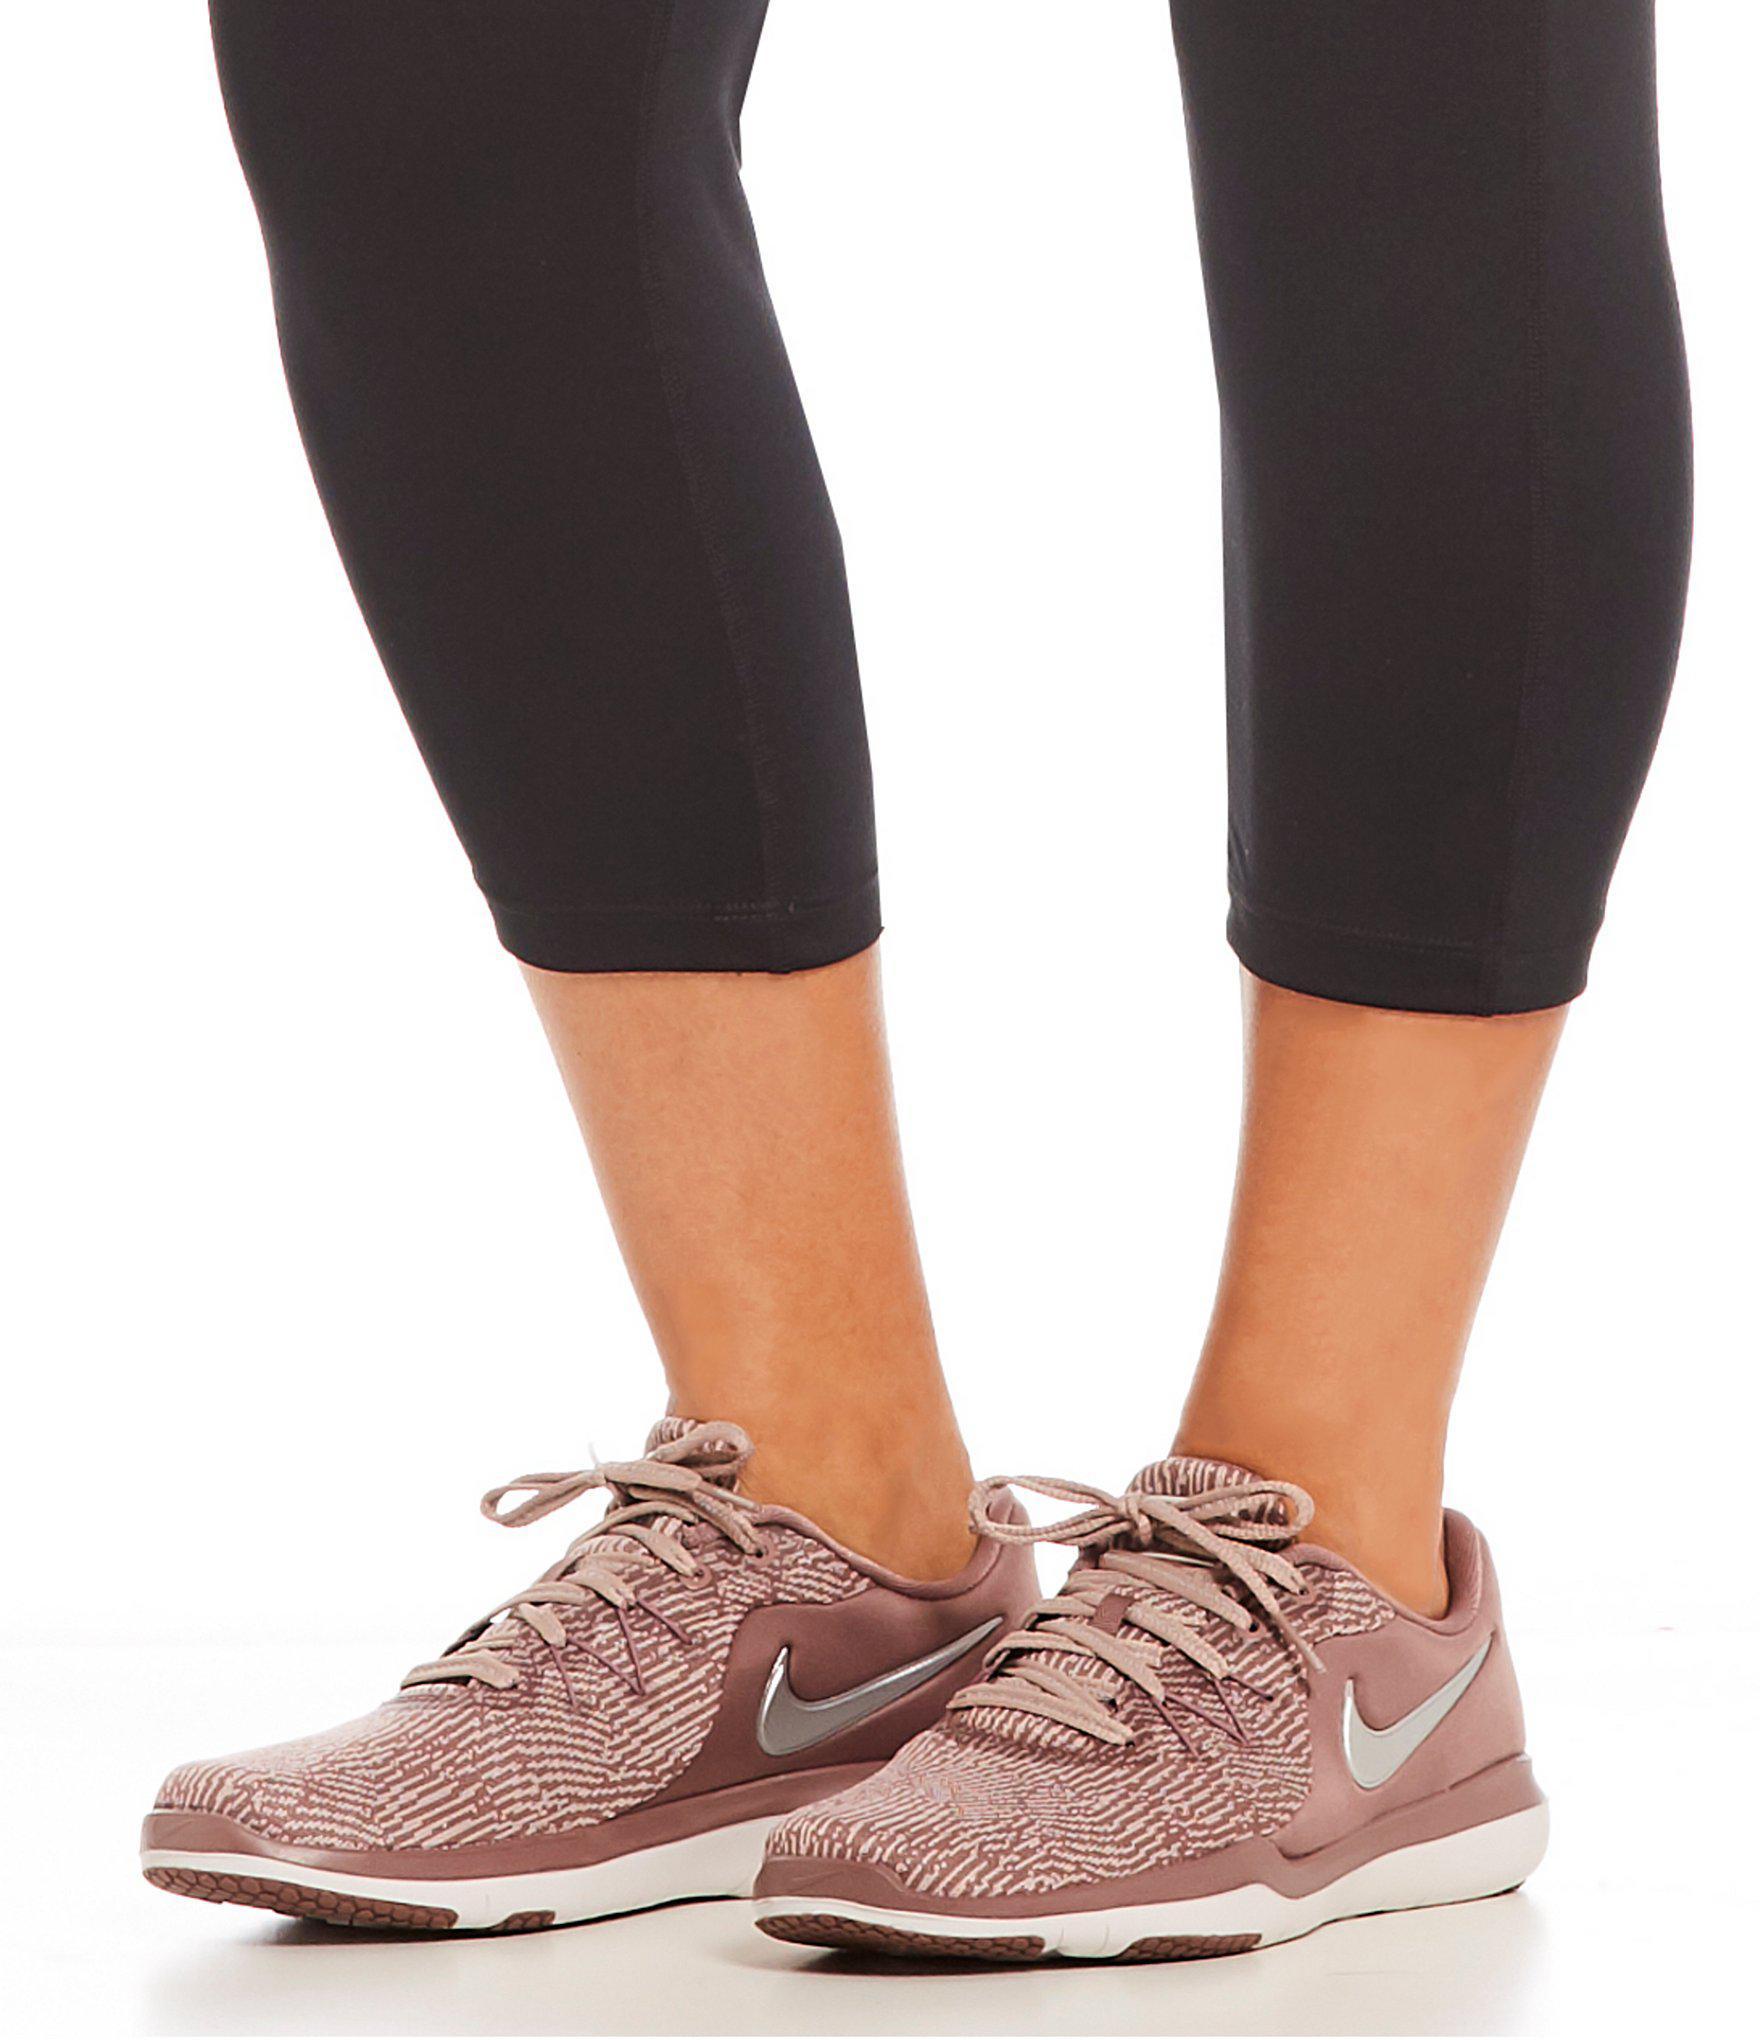 12a90c20b0e Nike Multicolor Women's Flex Supreme Tr 6 Print Training Shoe